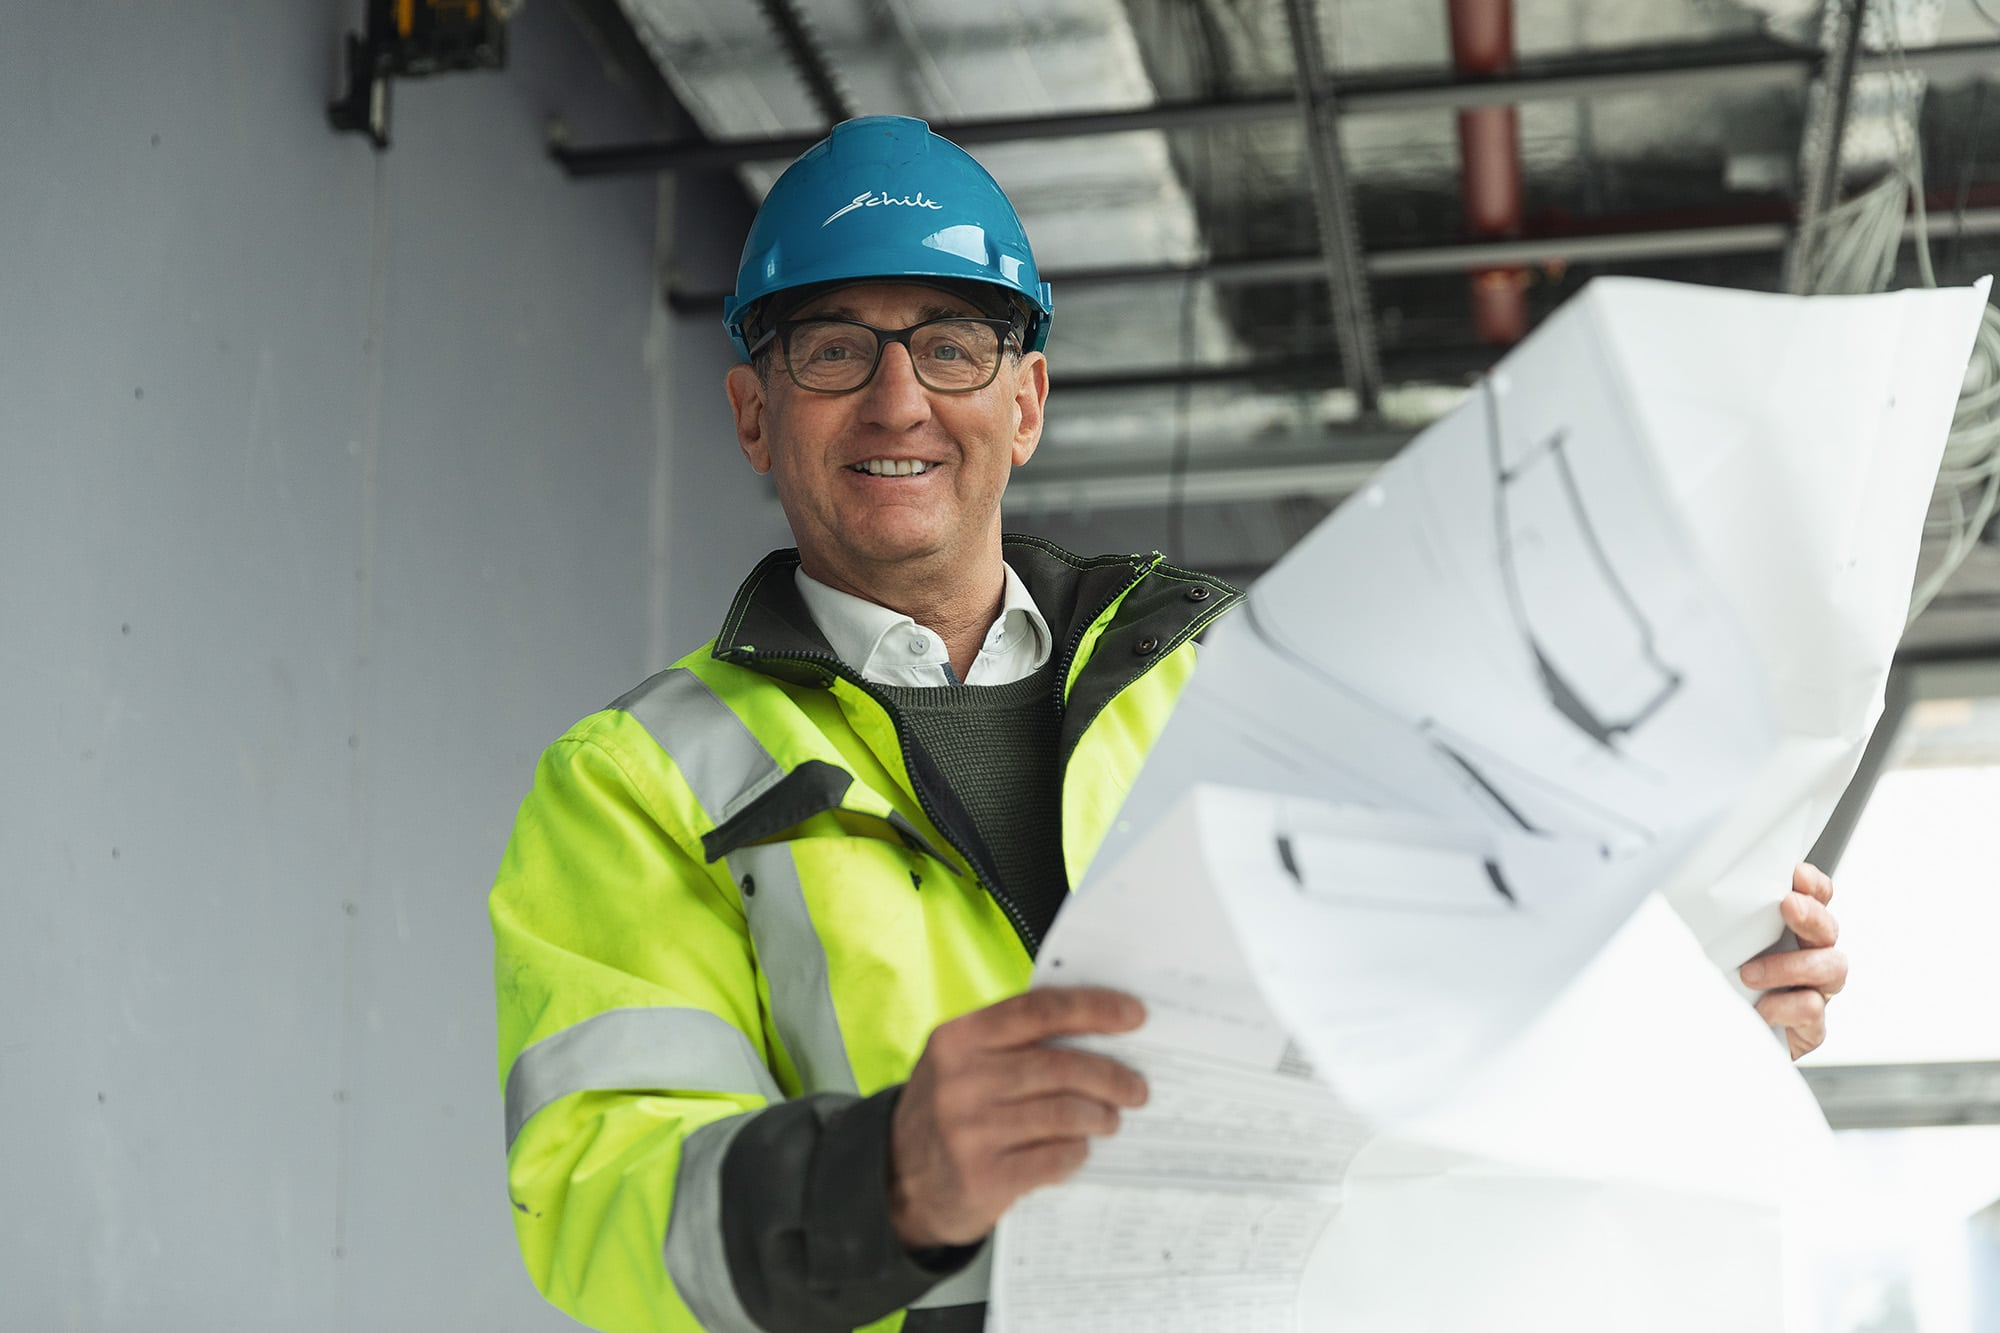 Vacature projectleider installatietechniek luchtkanalen